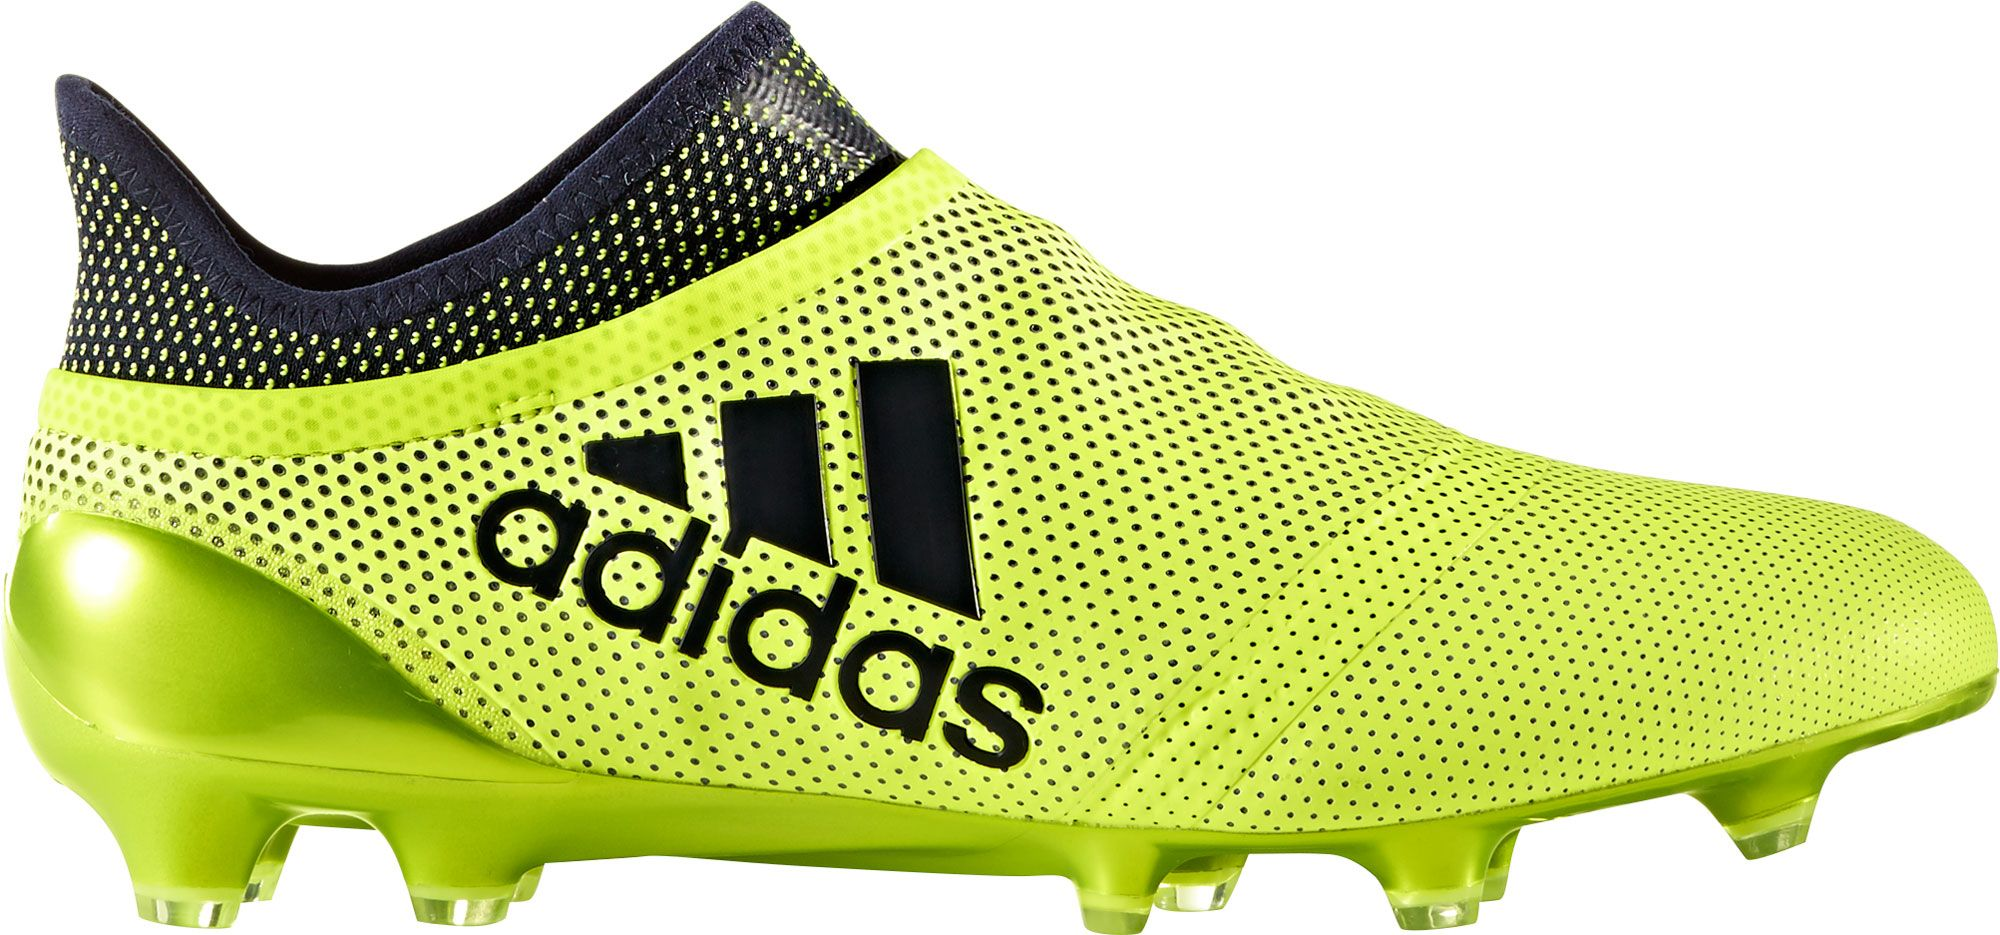 a525018e0804 ... adidas Mens X 17+ Purespeed FG Soccer Cleats DICKS Sporting . ...